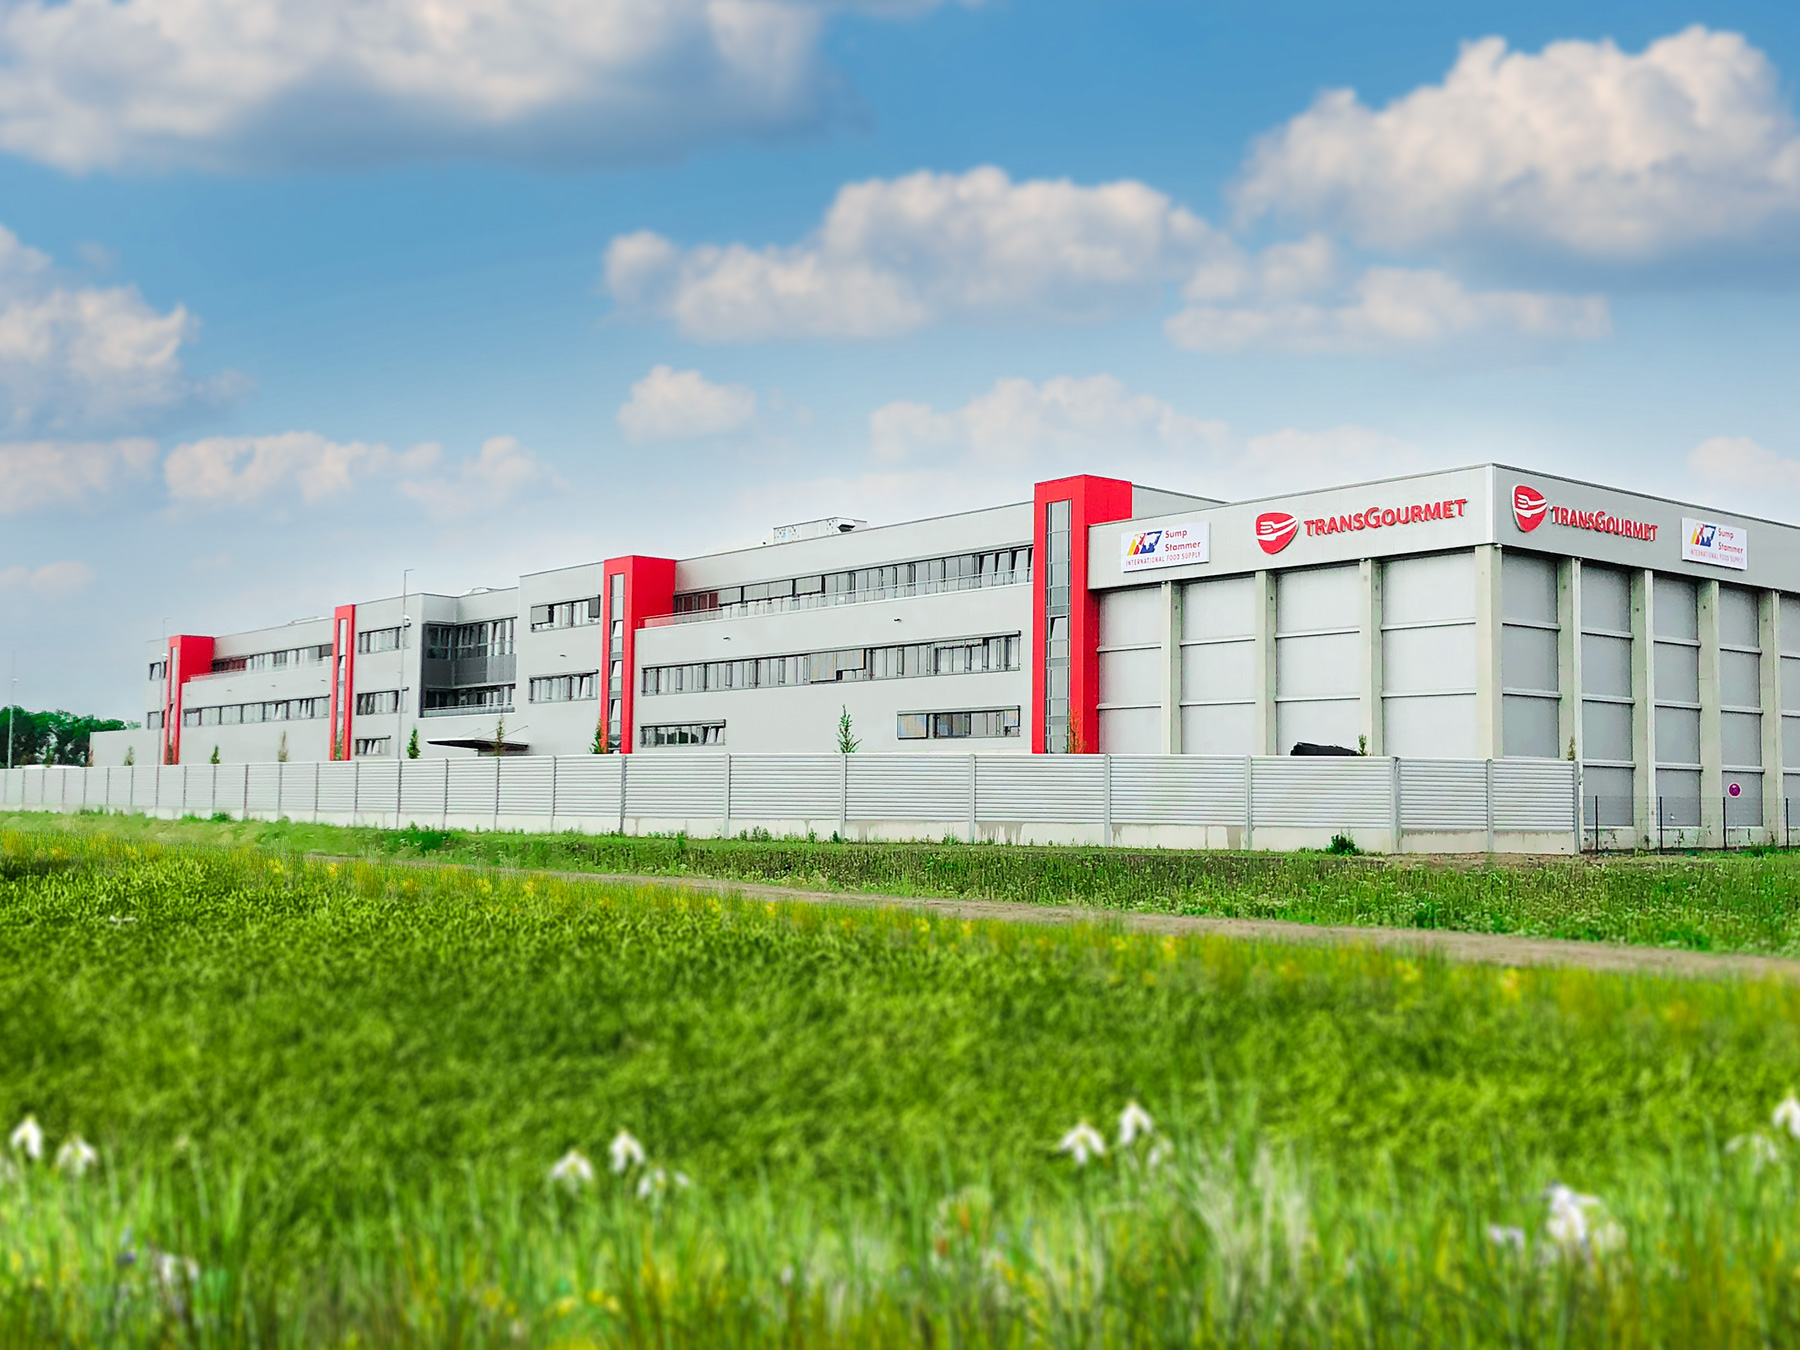 Hermann Schulten GmbH: Referenzobjekt TransGourmet Hamburg (Heizung & Sanitär)